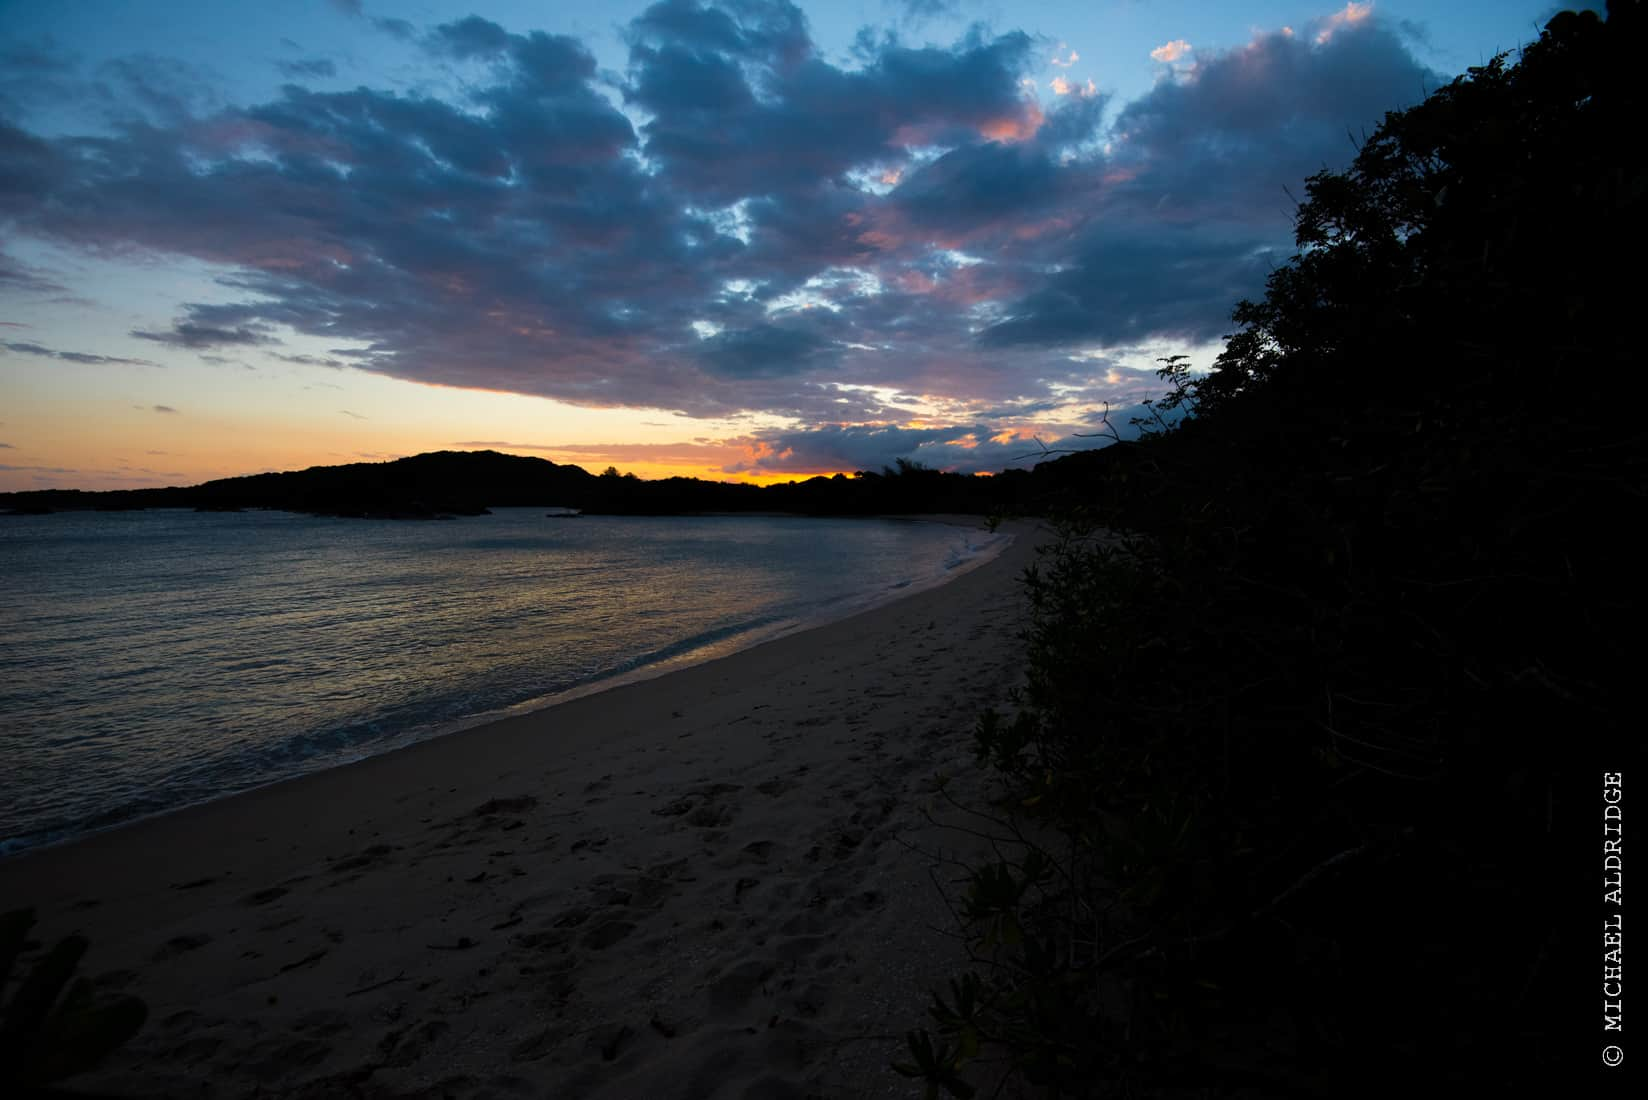 Sunset on beach in Madagascar